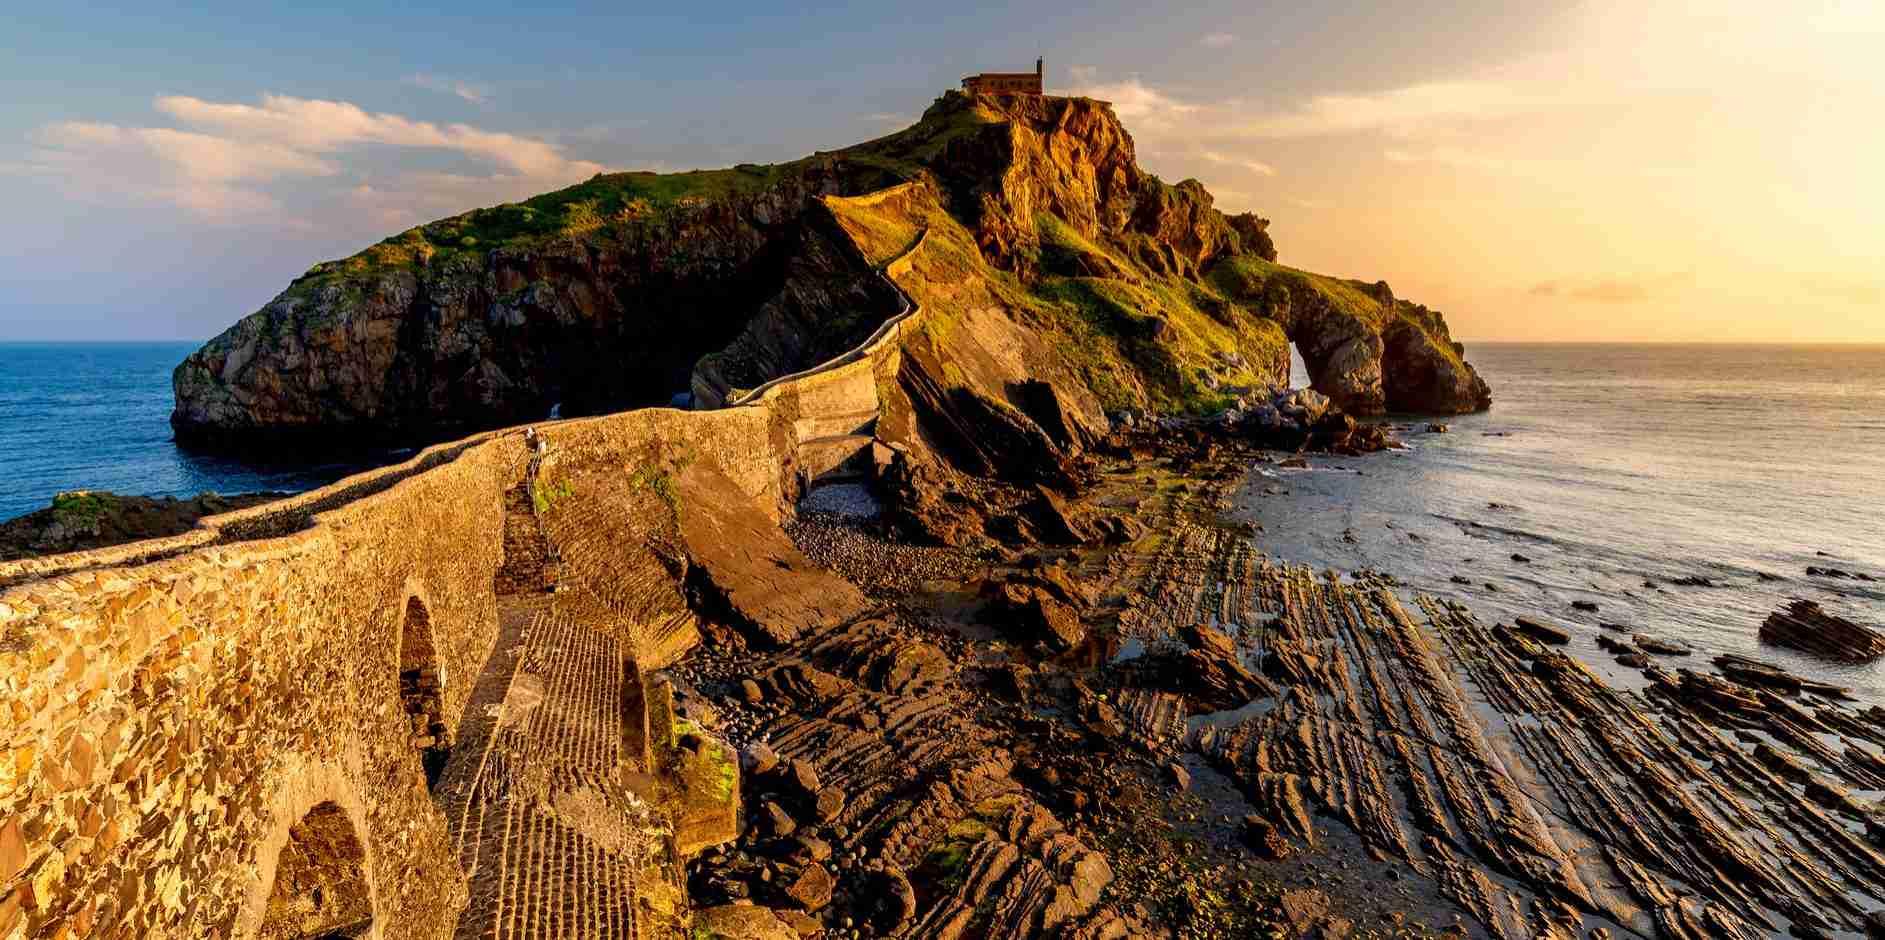 Basque Coast and Bay of Bilbao, Basque Coast Walking Holiday